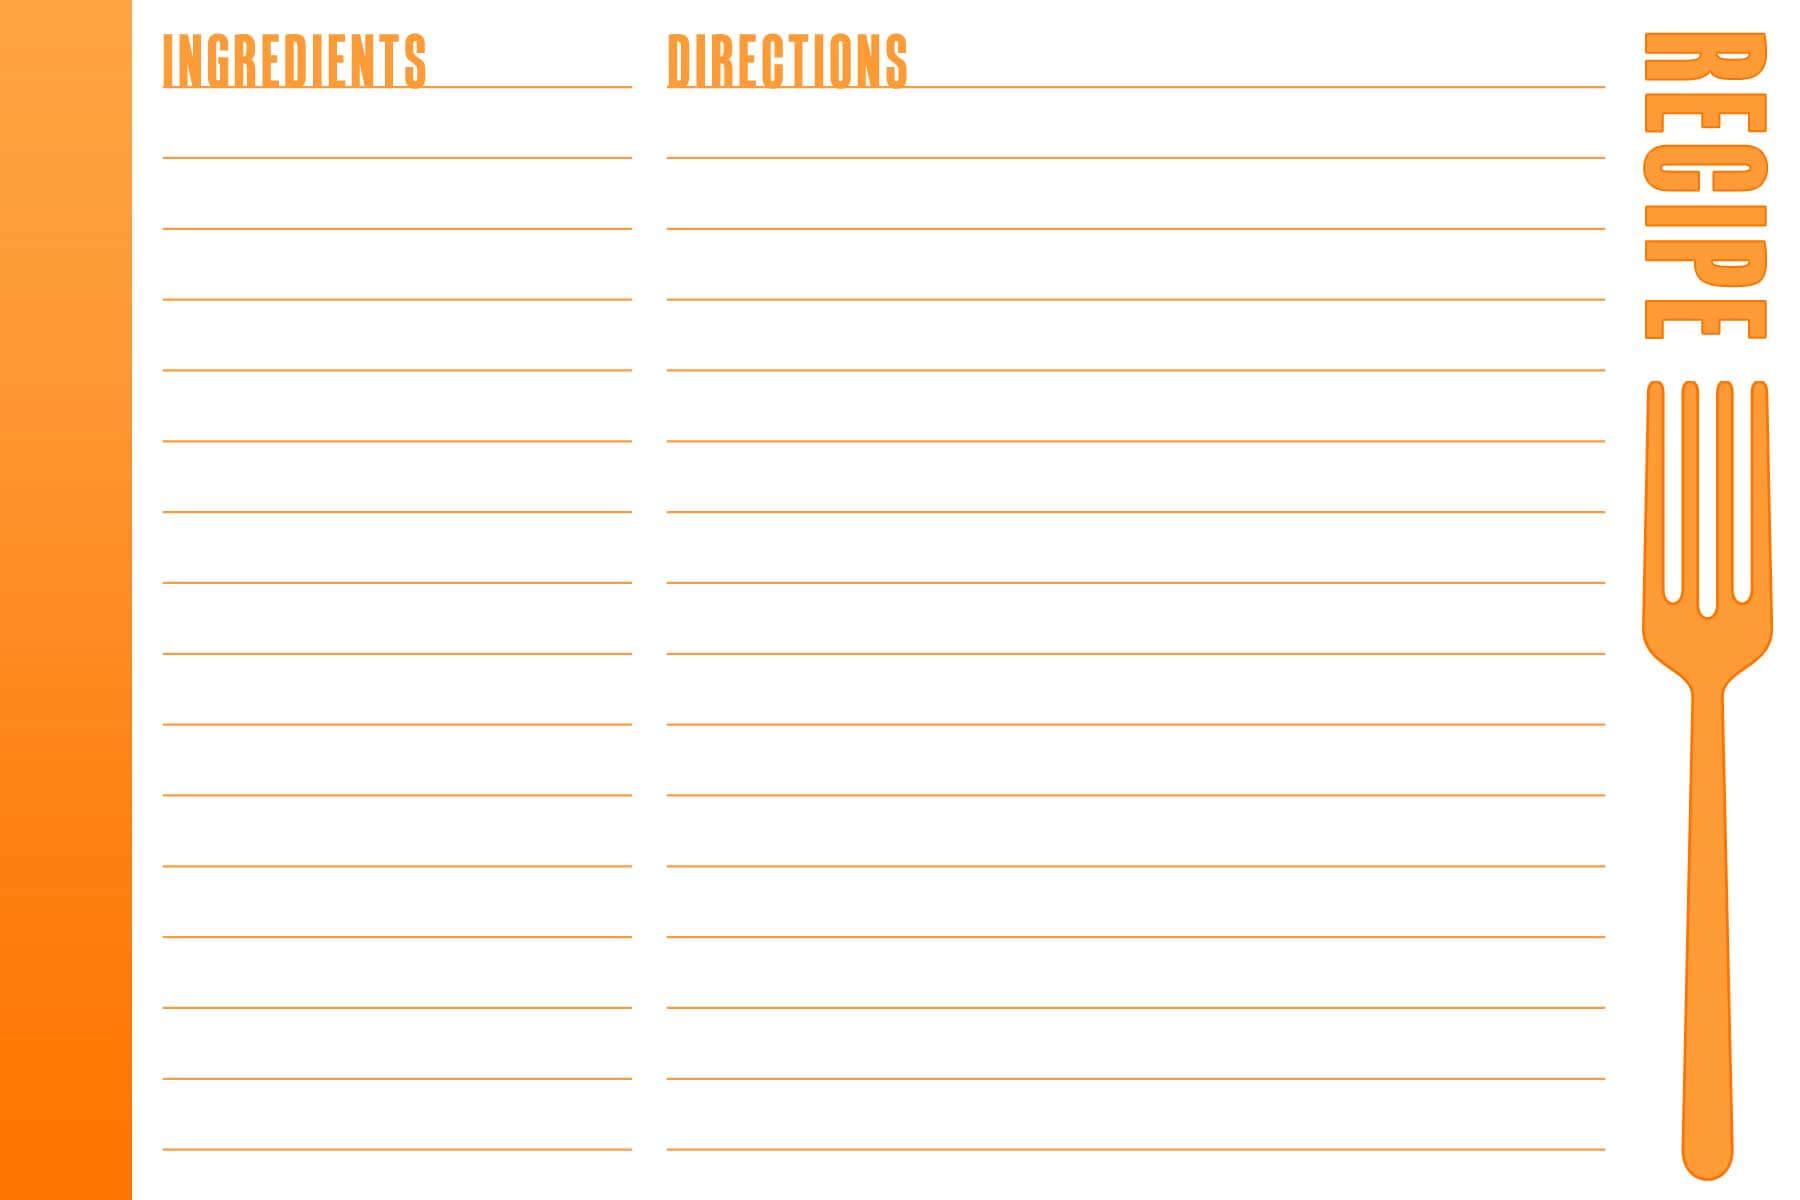 Recipe Card Template 650*434 – Recipe Card Template Wcko3Vf2 For Fillable Recipe Card Template